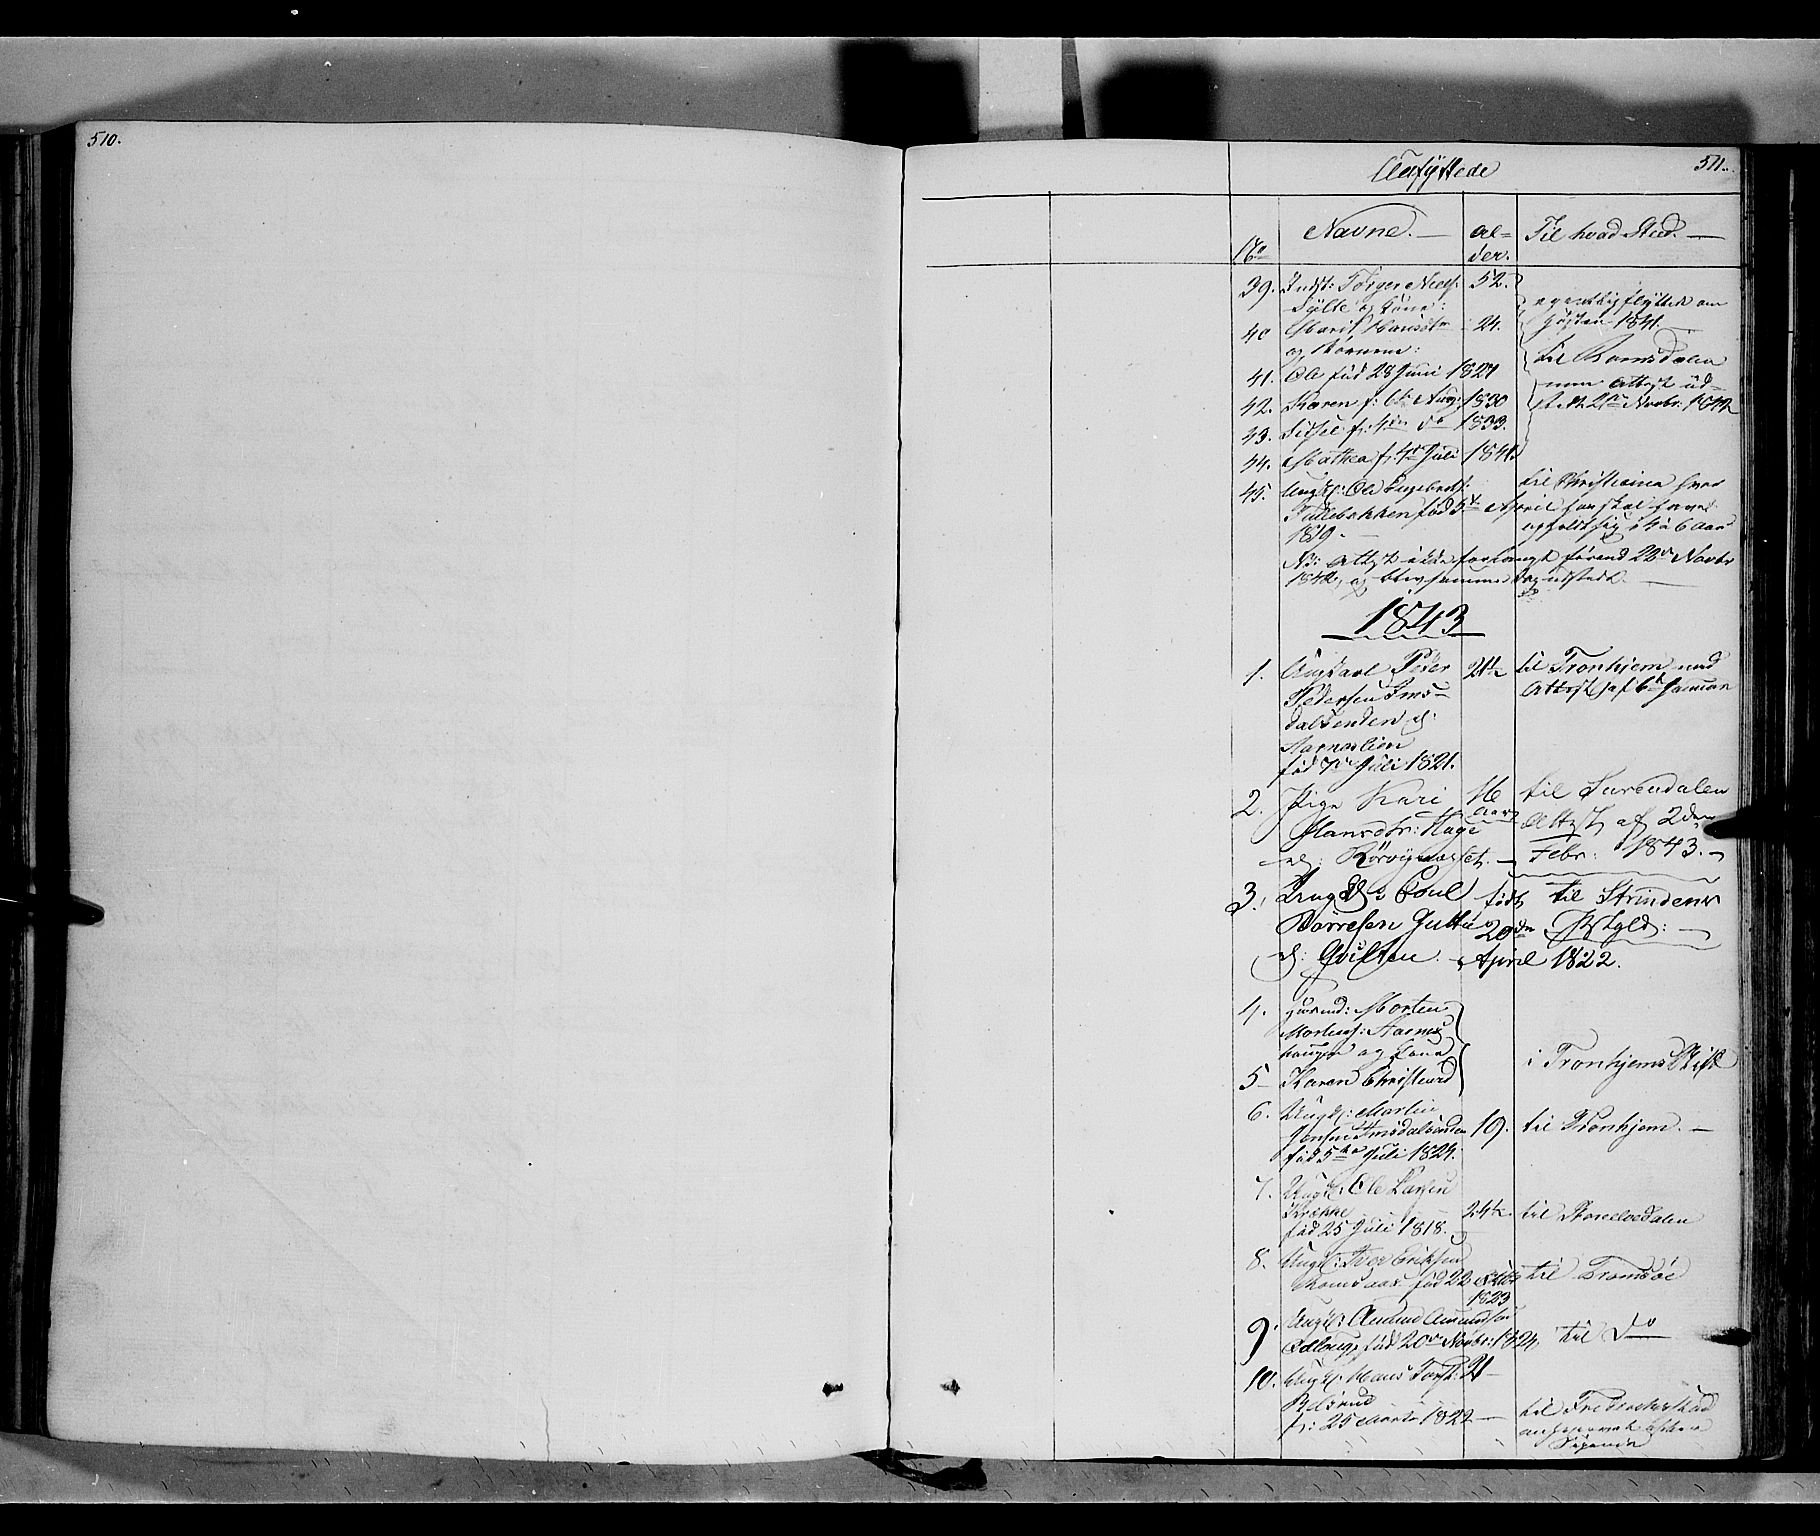 SAH, Ringebu prestekontor, Ministerialbok nr. 5, 1839-1848, s. 510-511